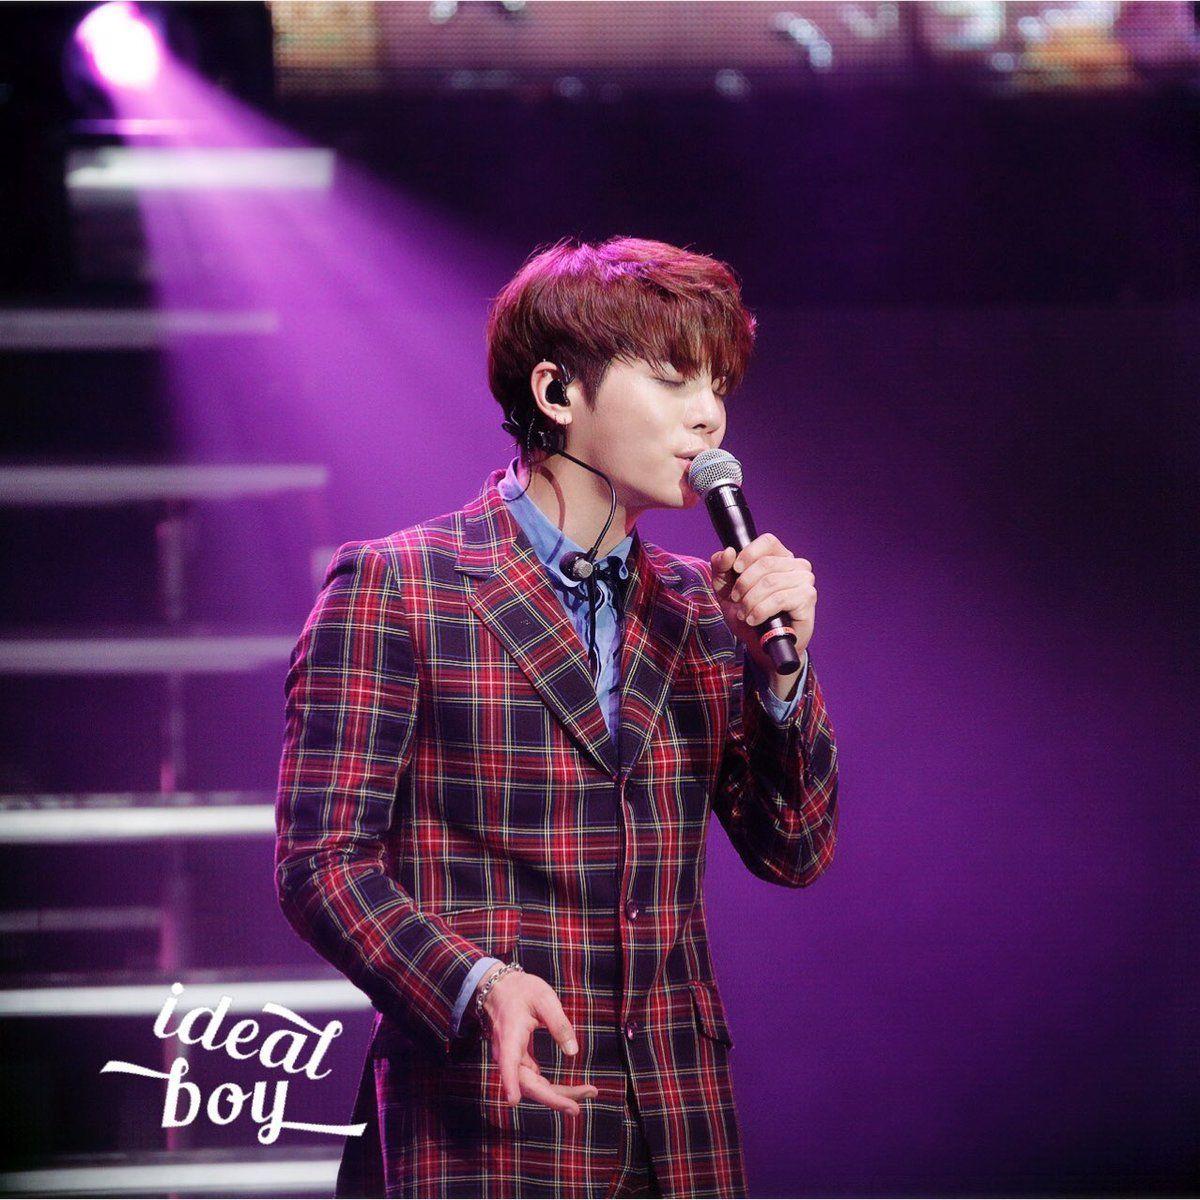 March 26th 2017 at LA Shinee world v, Jonghyun, Shinee